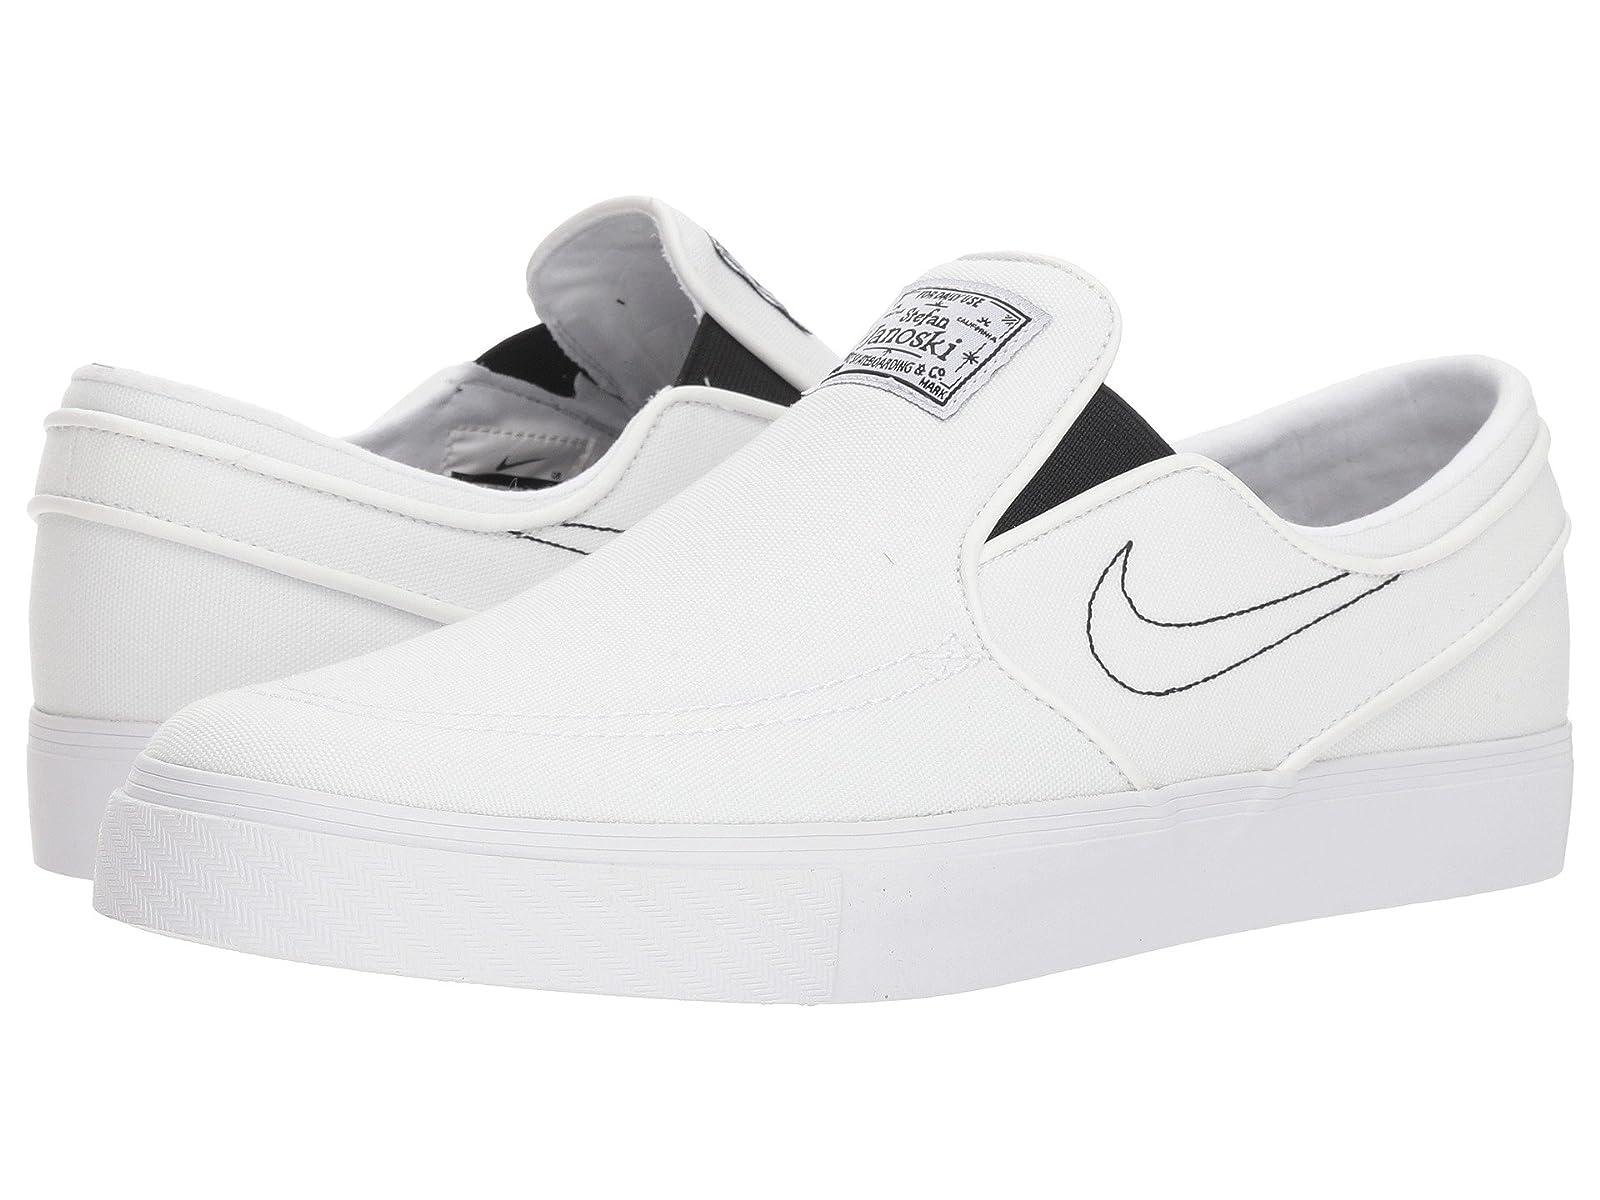 Nike SB Zoom Stefan Janoski Slip-on CanvasAtmospheric grades have affordable shoes